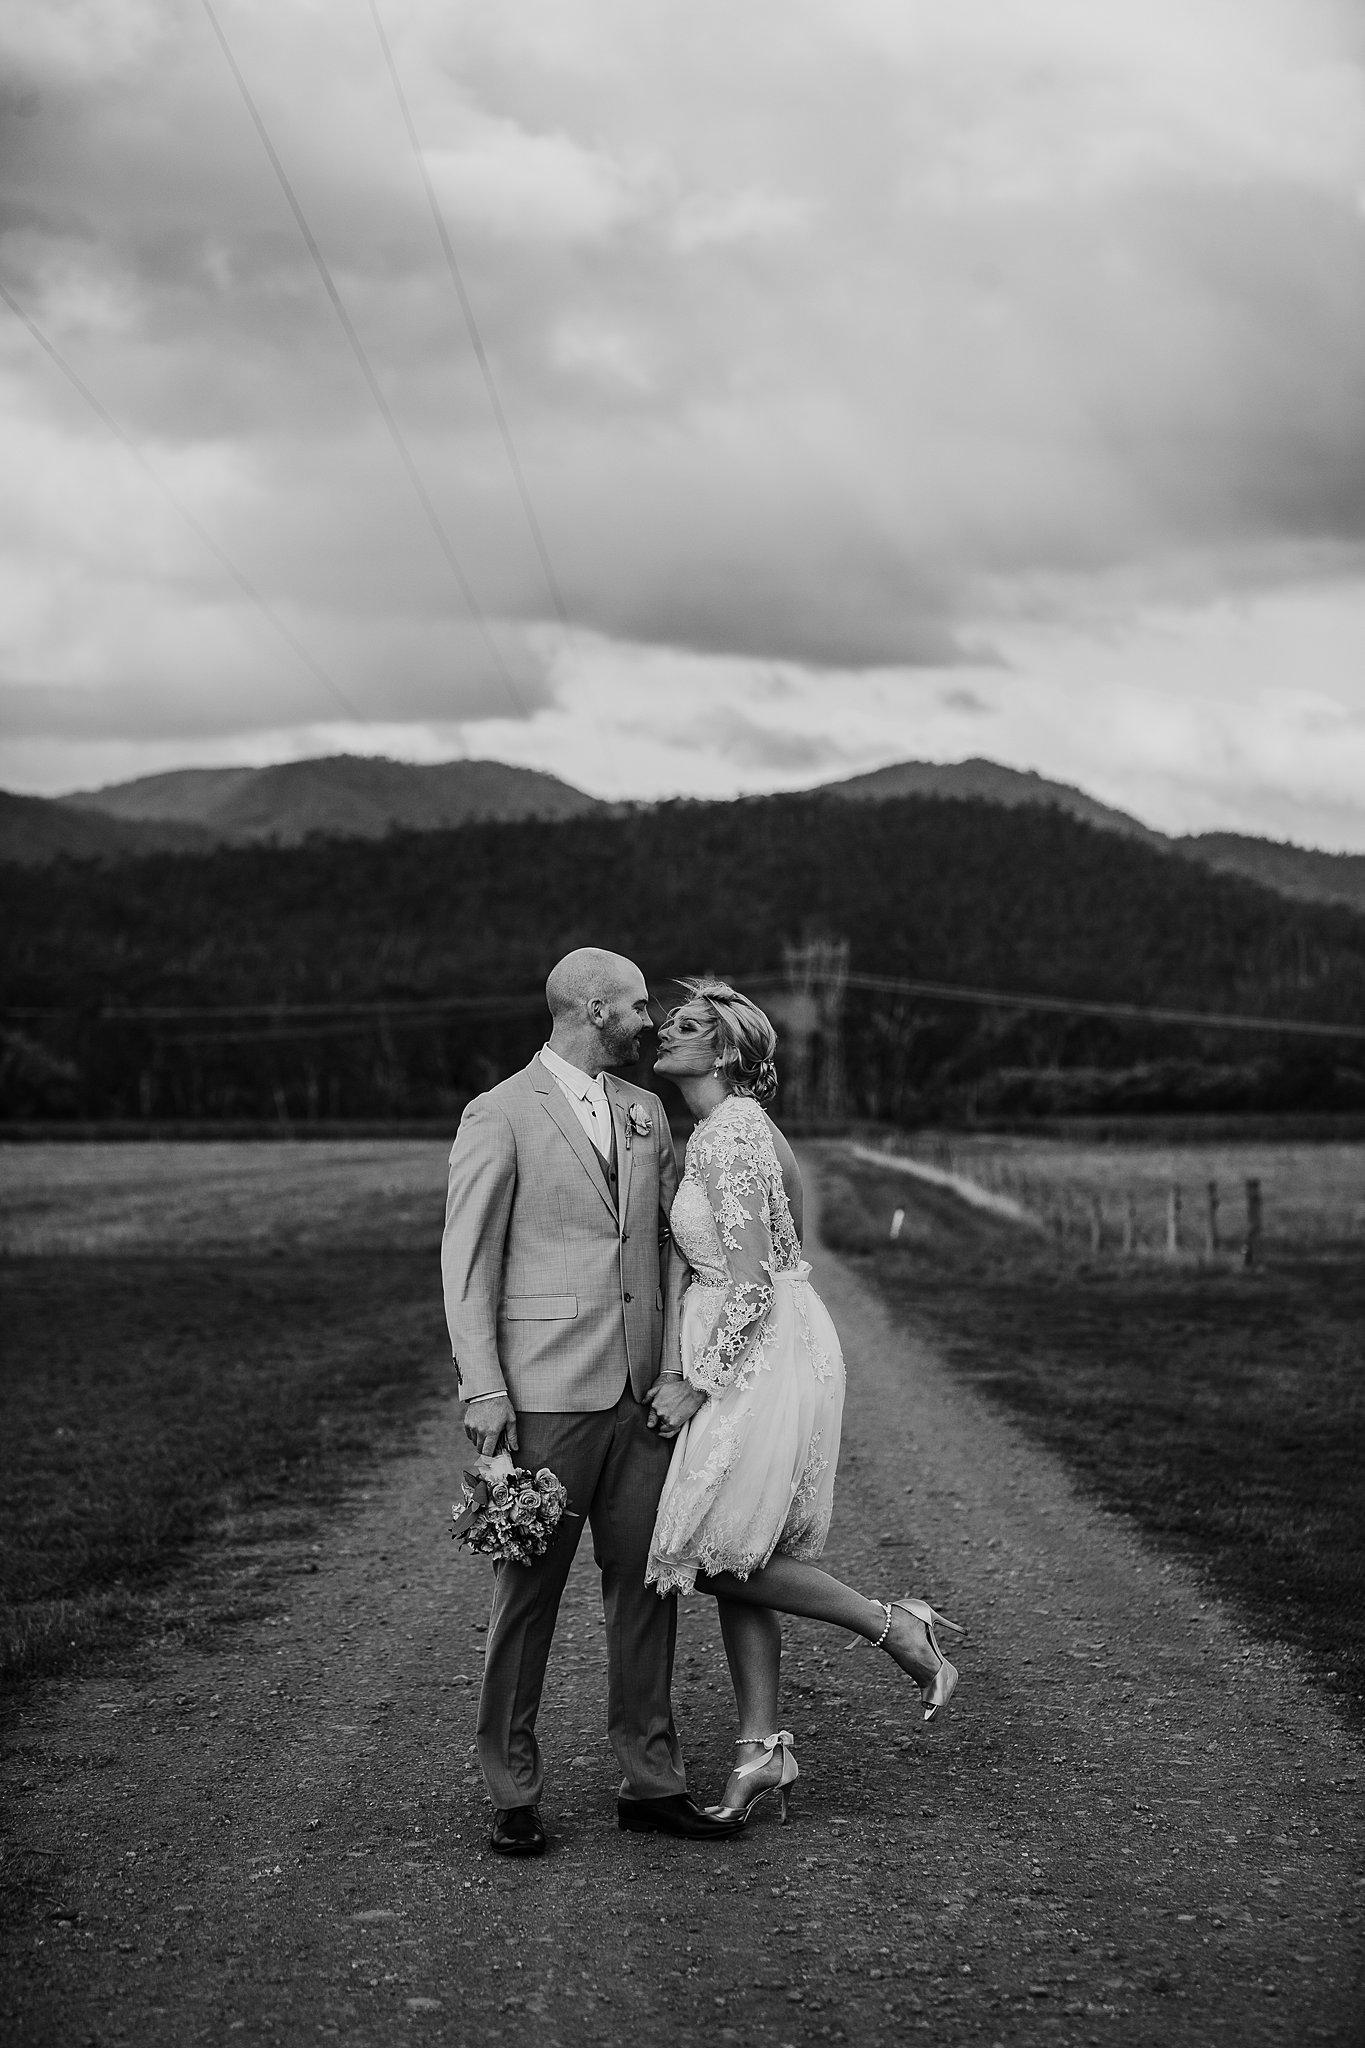 mickalathomas_puremacphotography_weddingphotographer_couplephotographer_Sheppartonphotographer_3458.jpg